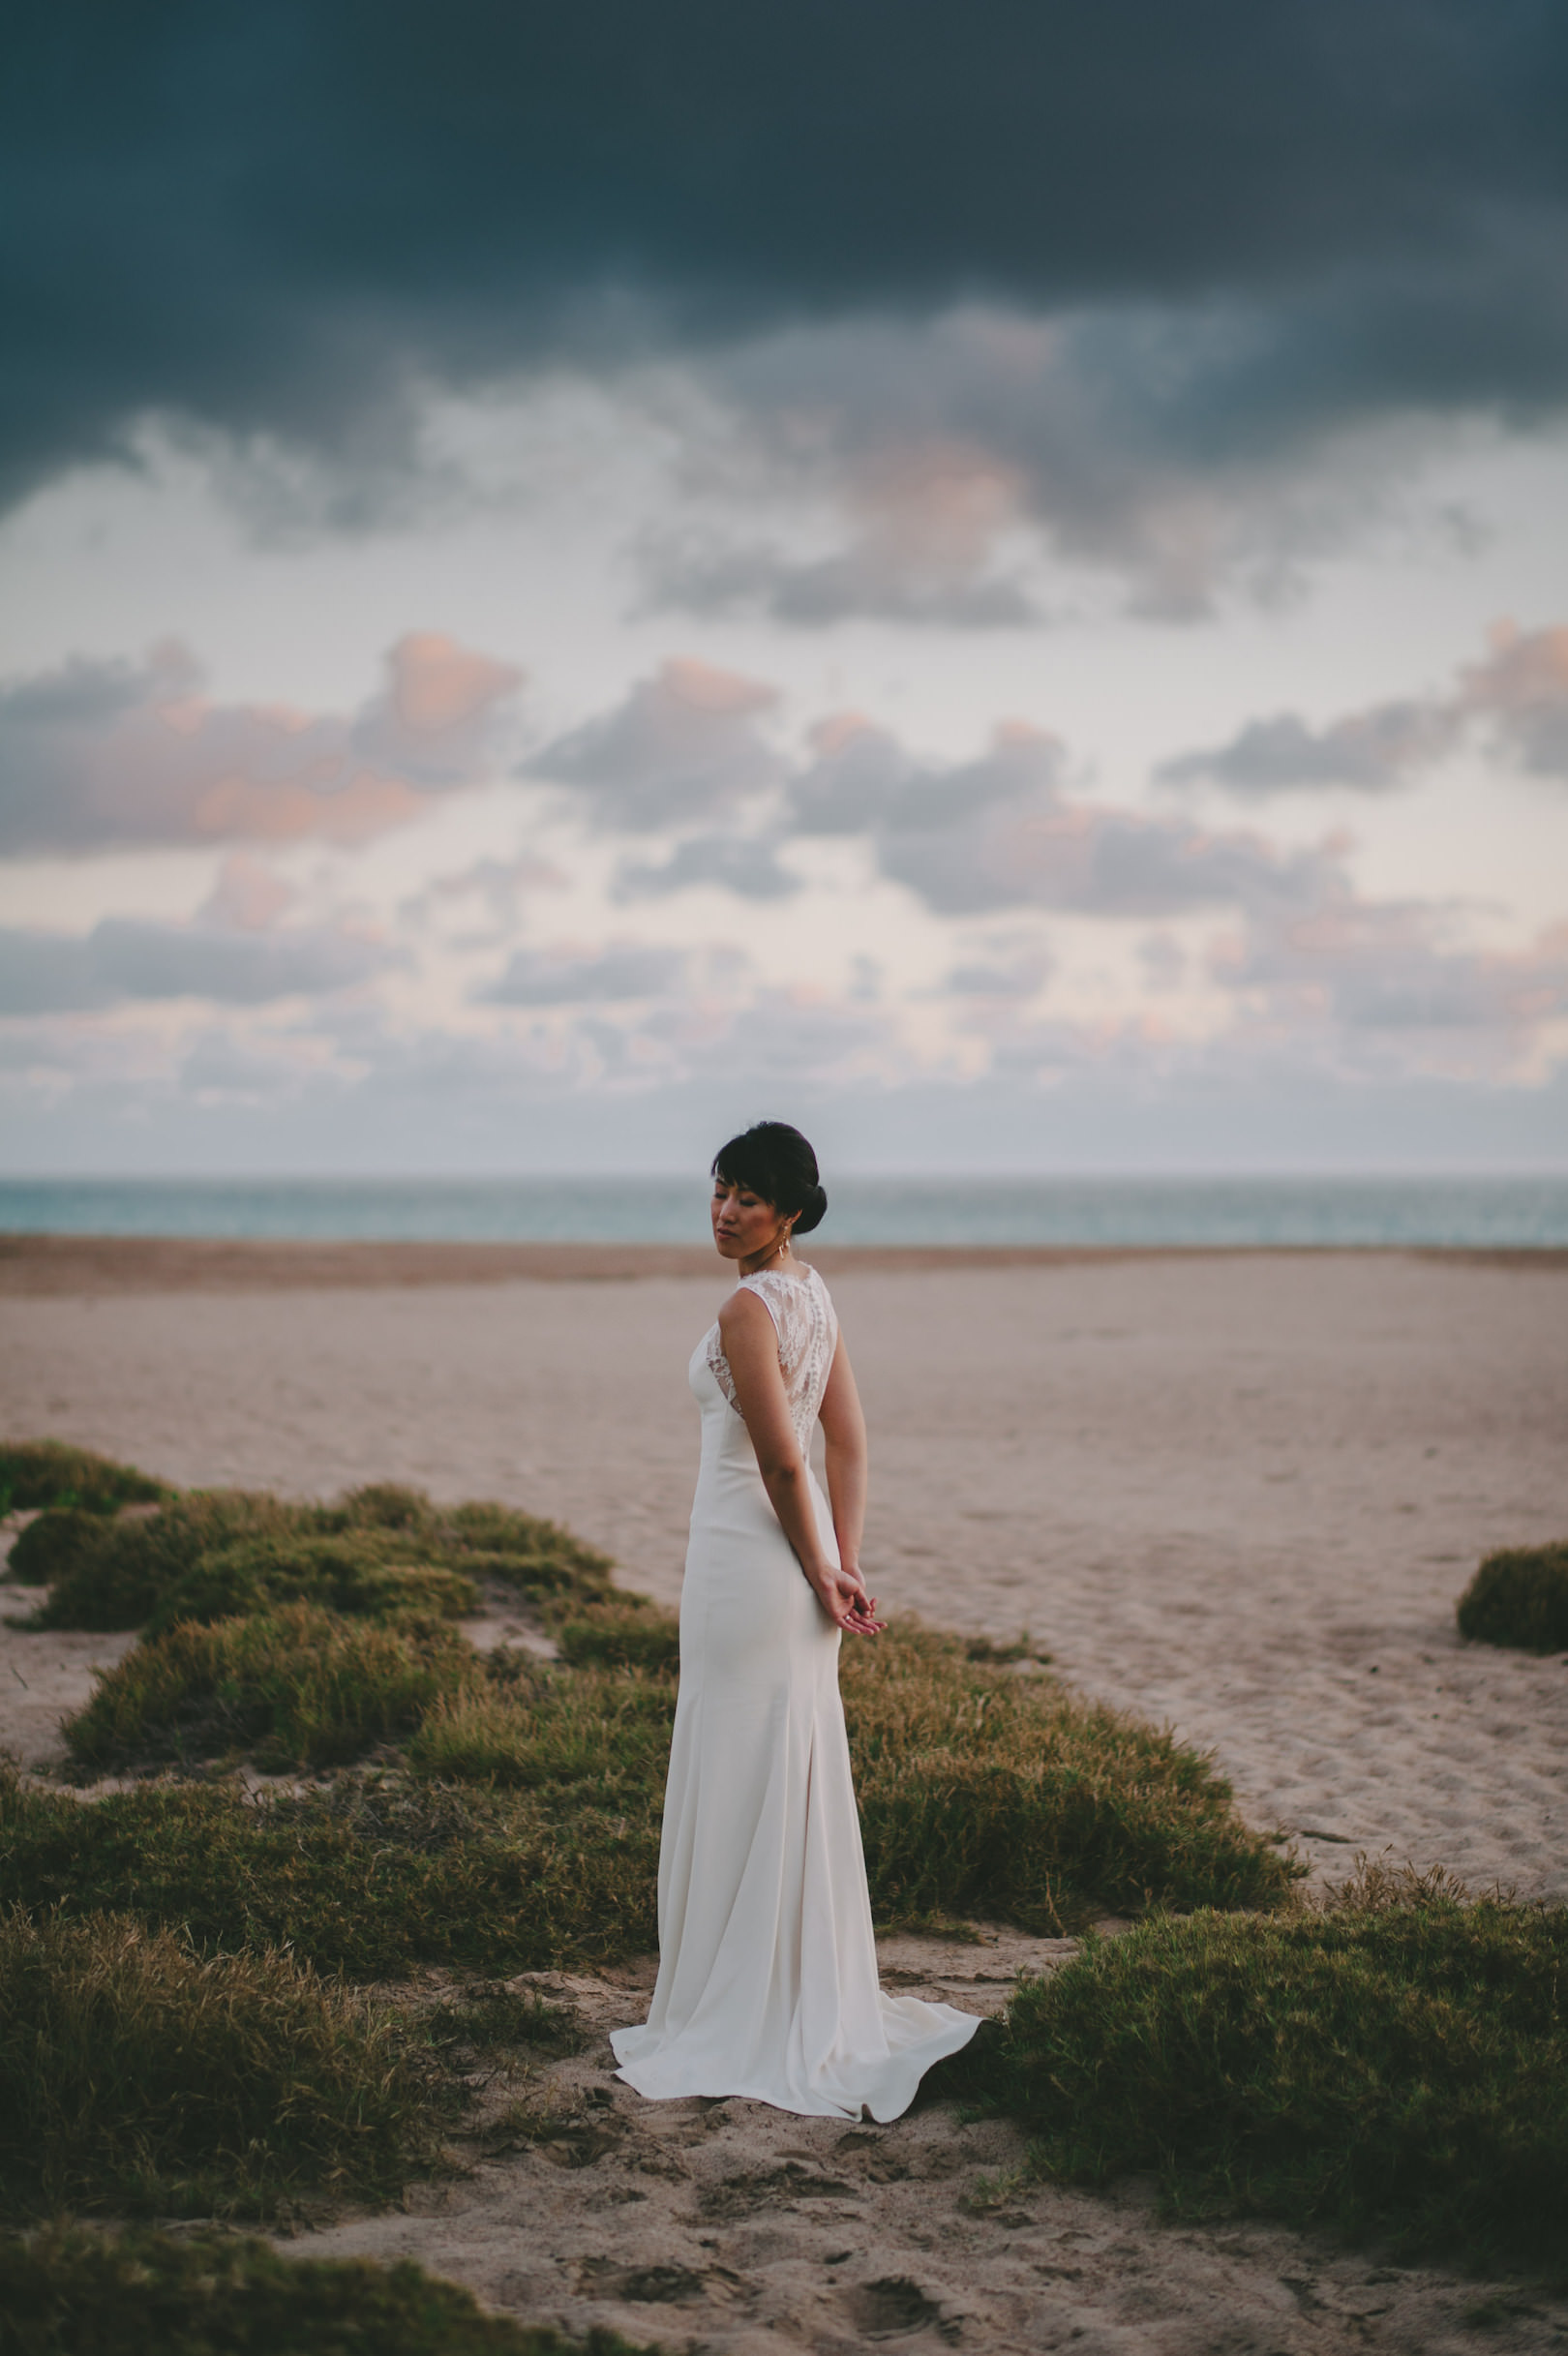 Nathan & Felicia - Wedding Day - © Dallas Kolotylo Photography - 595